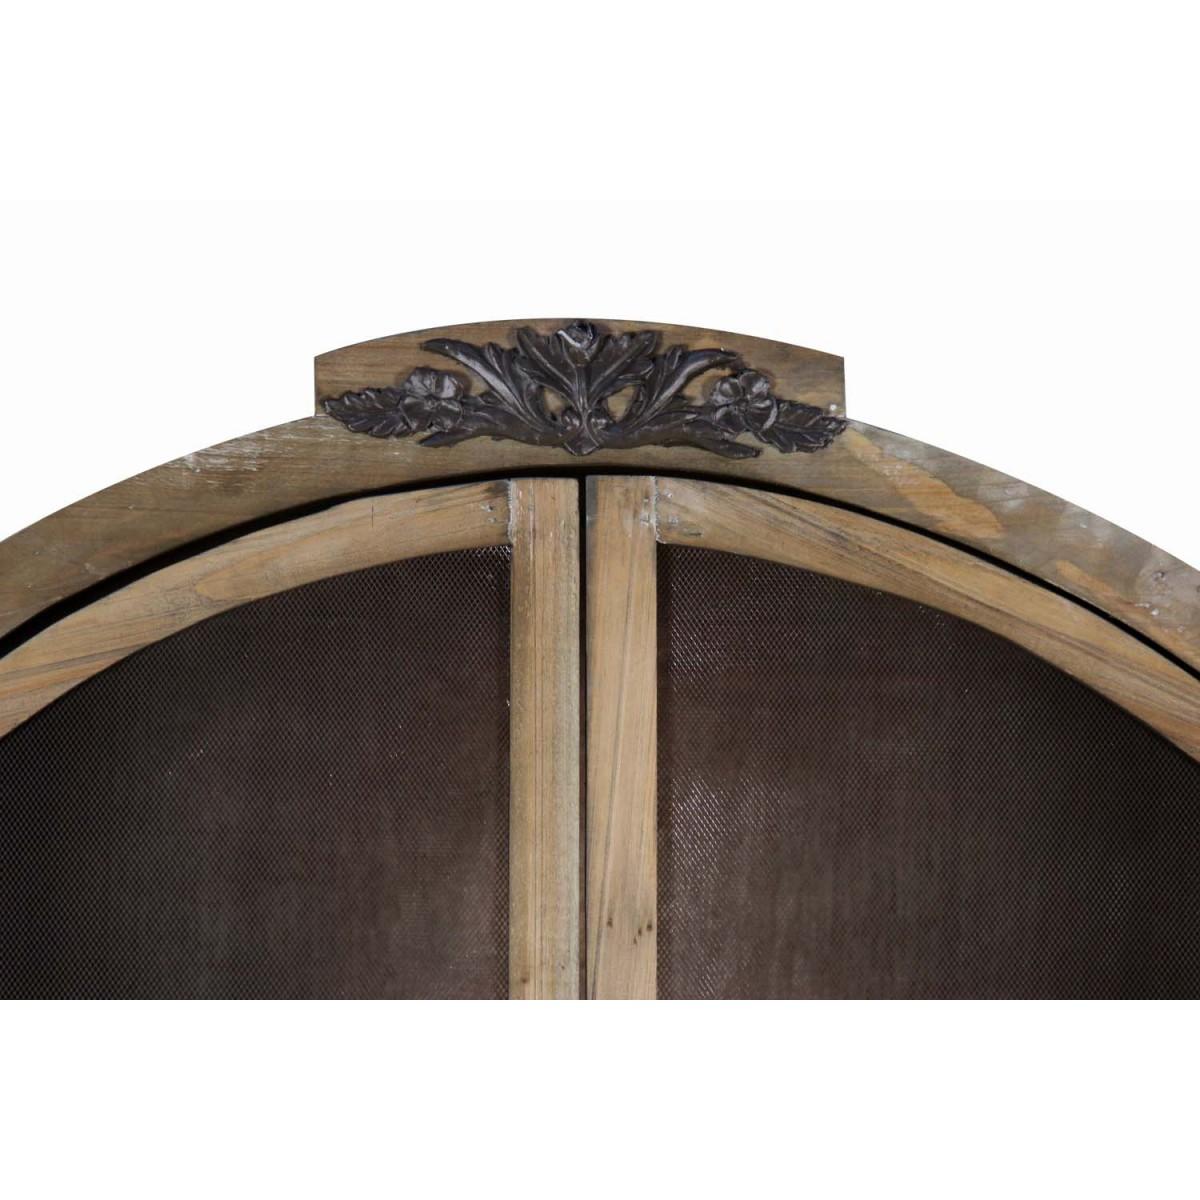 Buffet Vaisselier Rangement Bois 84.5x41.5x184cm